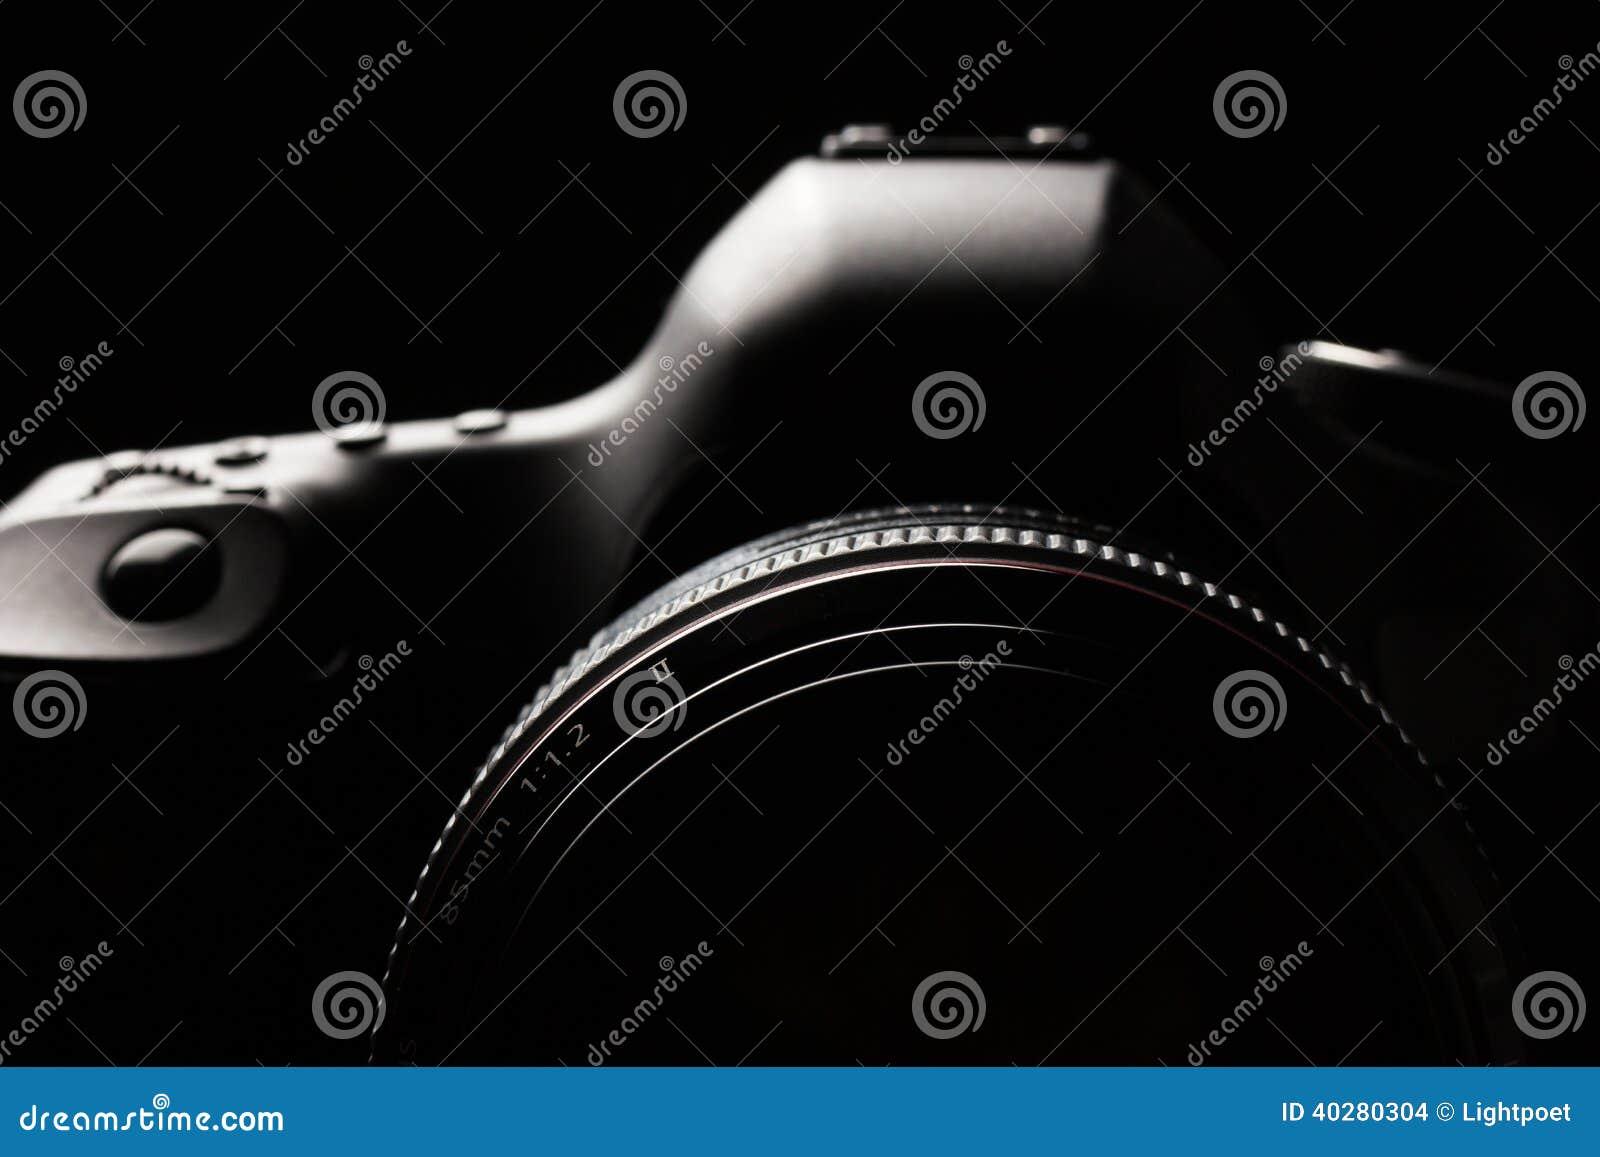 Imagen oscura de la cámara moderna profesional de DSLR